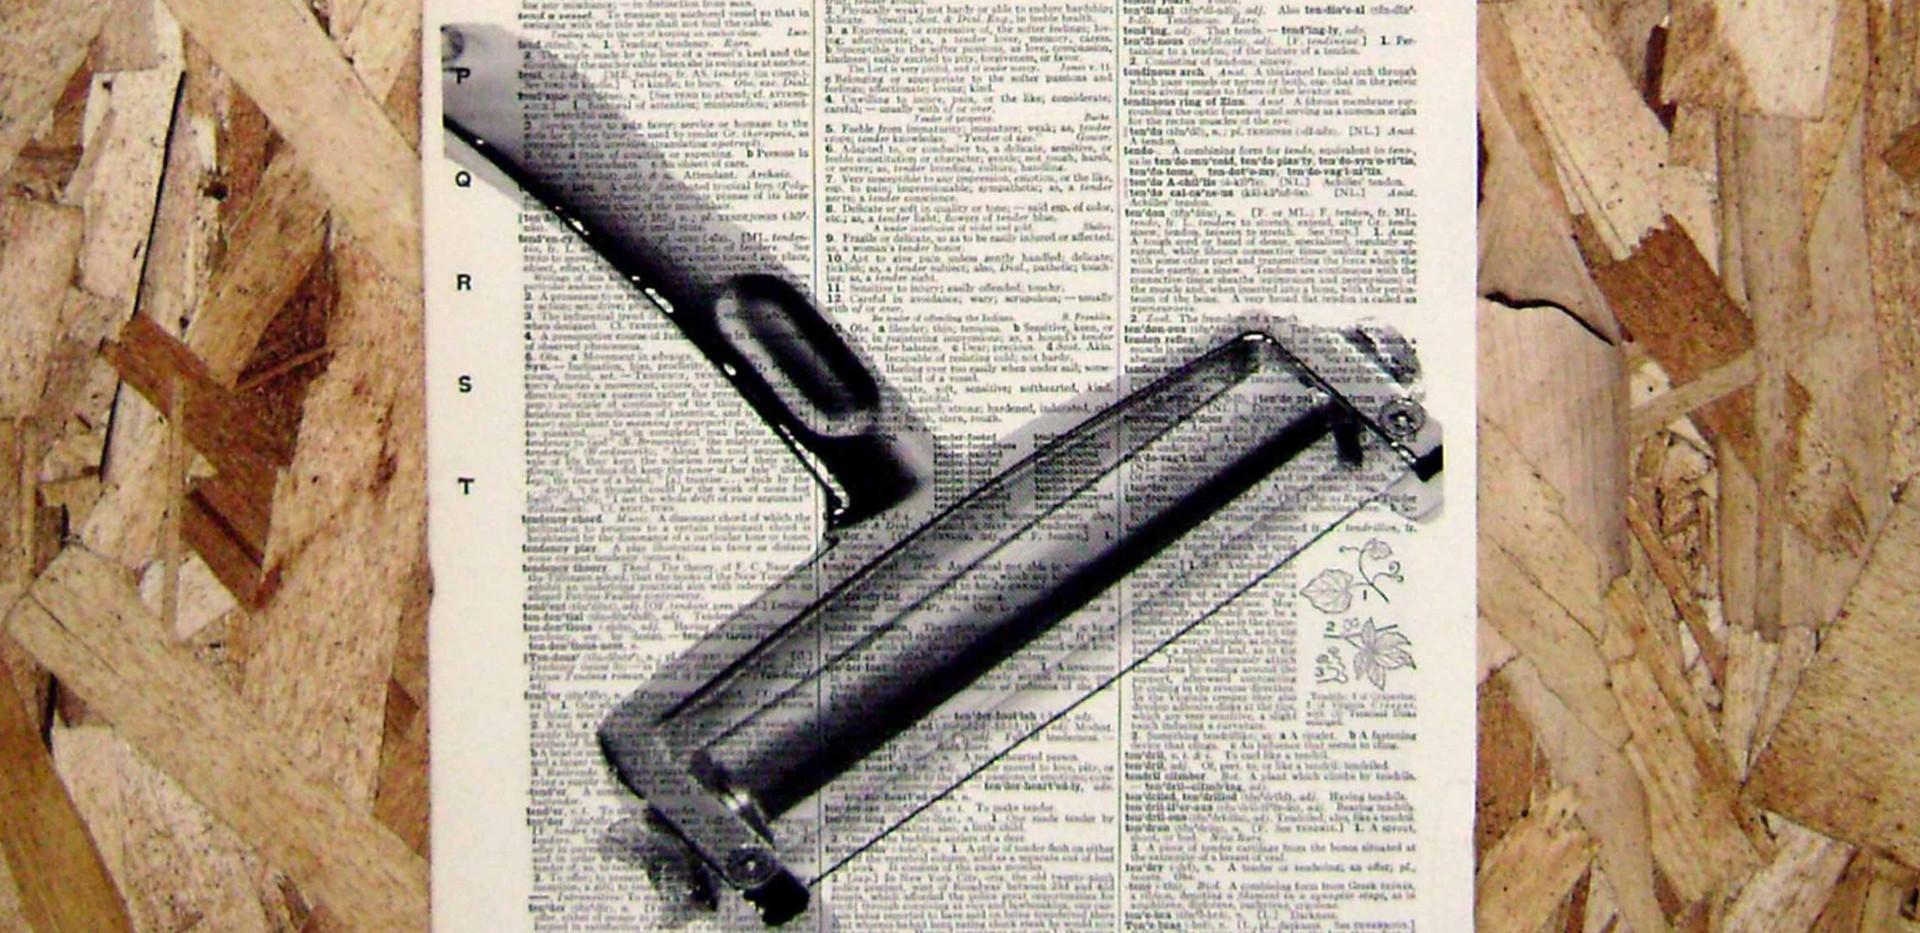 Common Object - Utilitarian 1